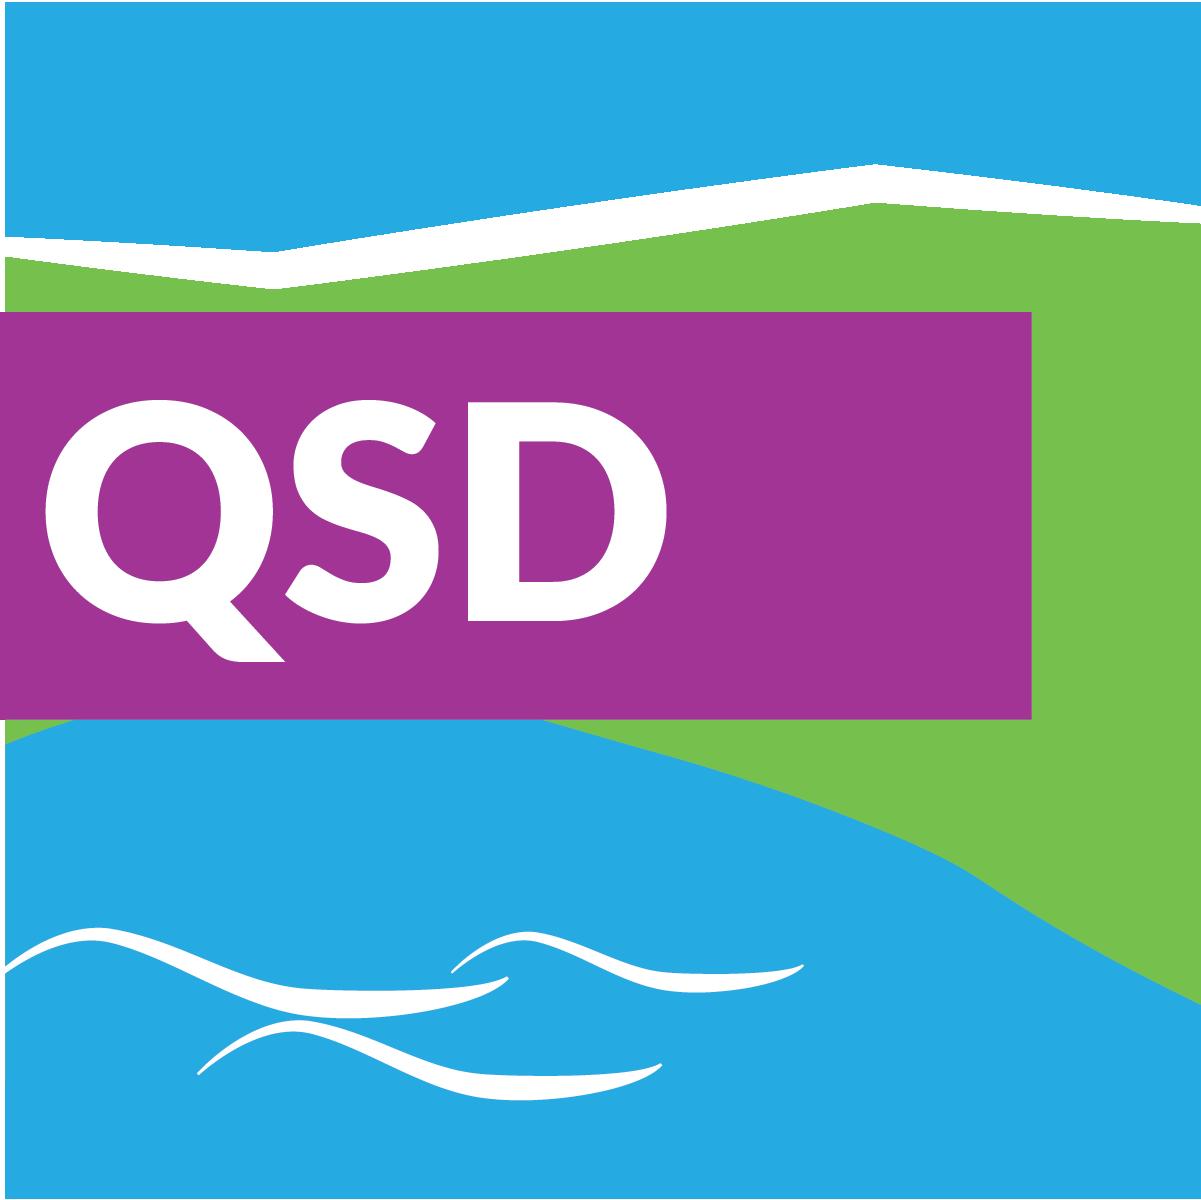 Qualified Stormwater developer training